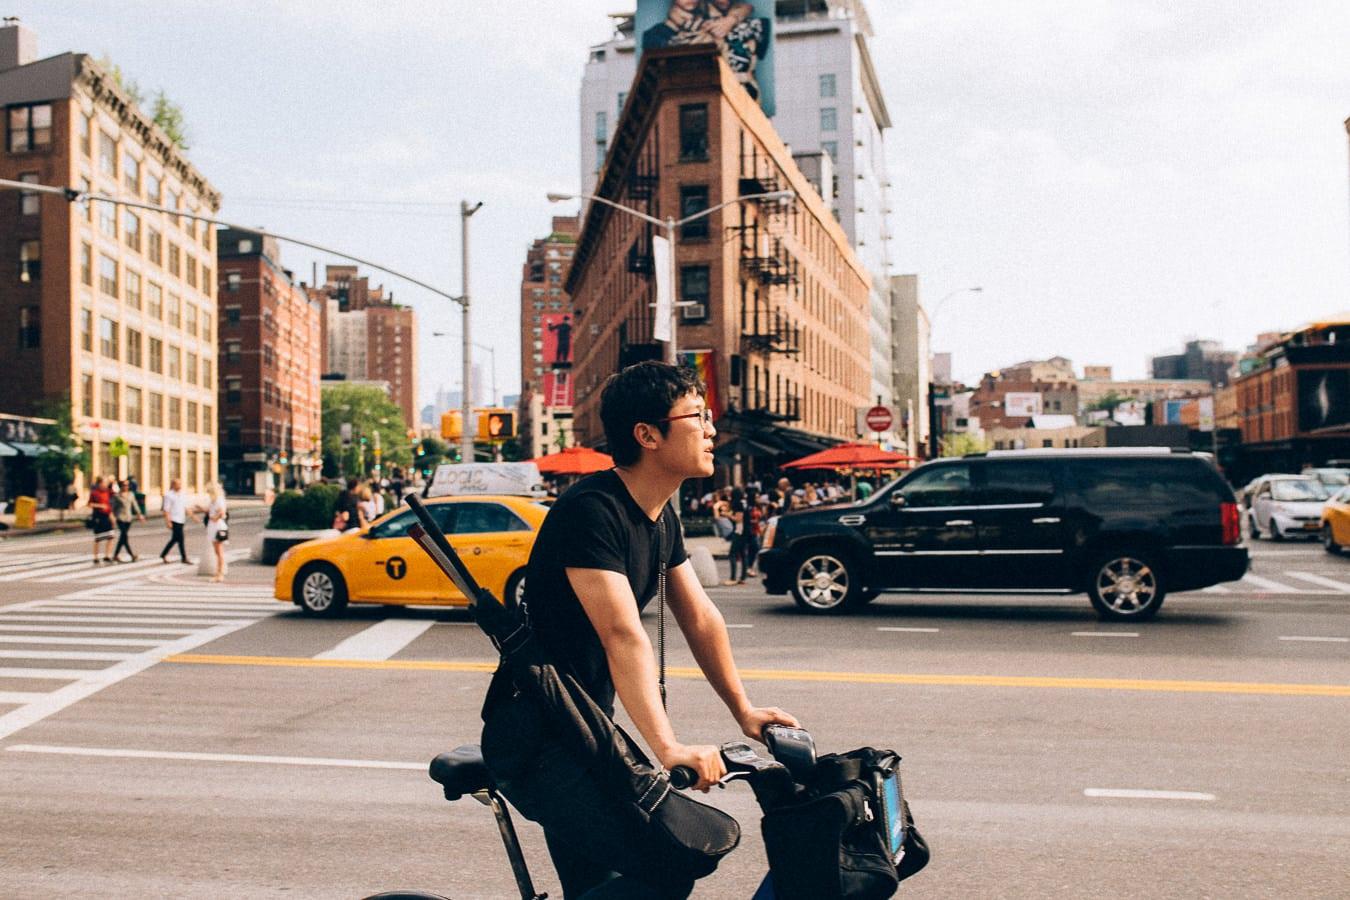 14th st new york city